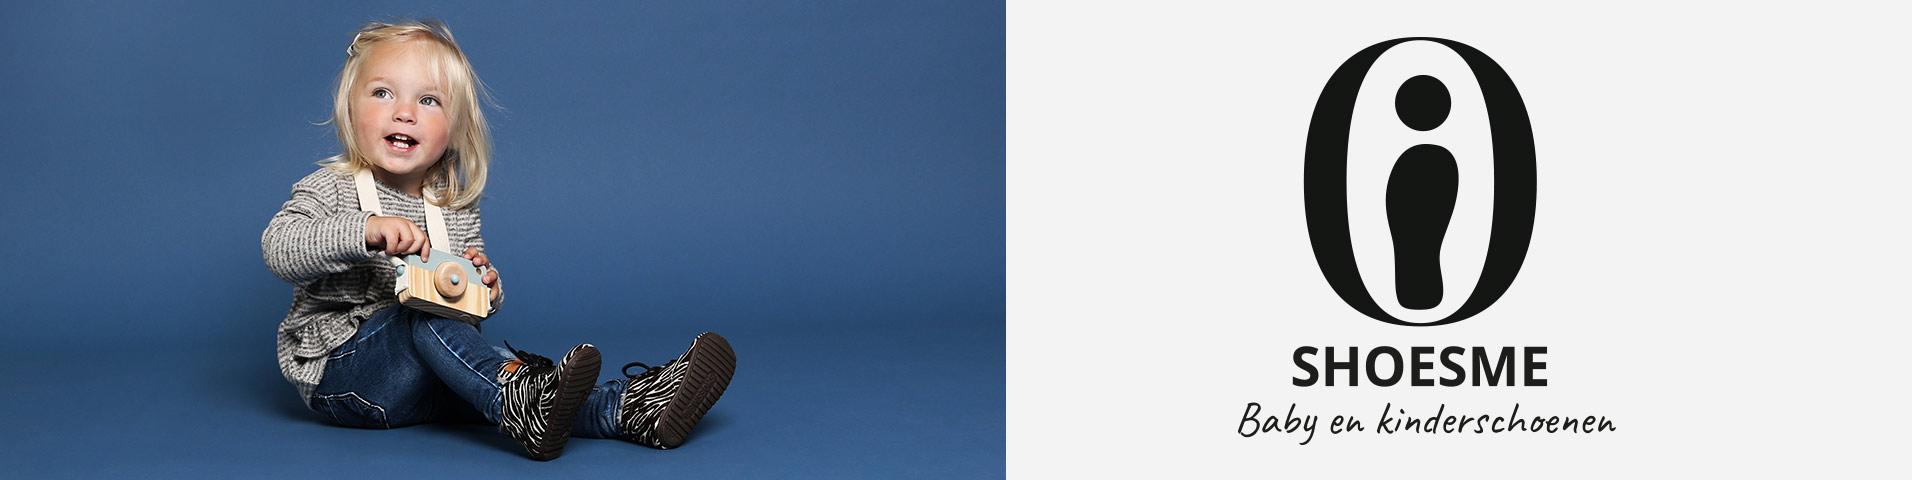 Shoesme Sko   Køb dine nye sko online hos Zalando.dk